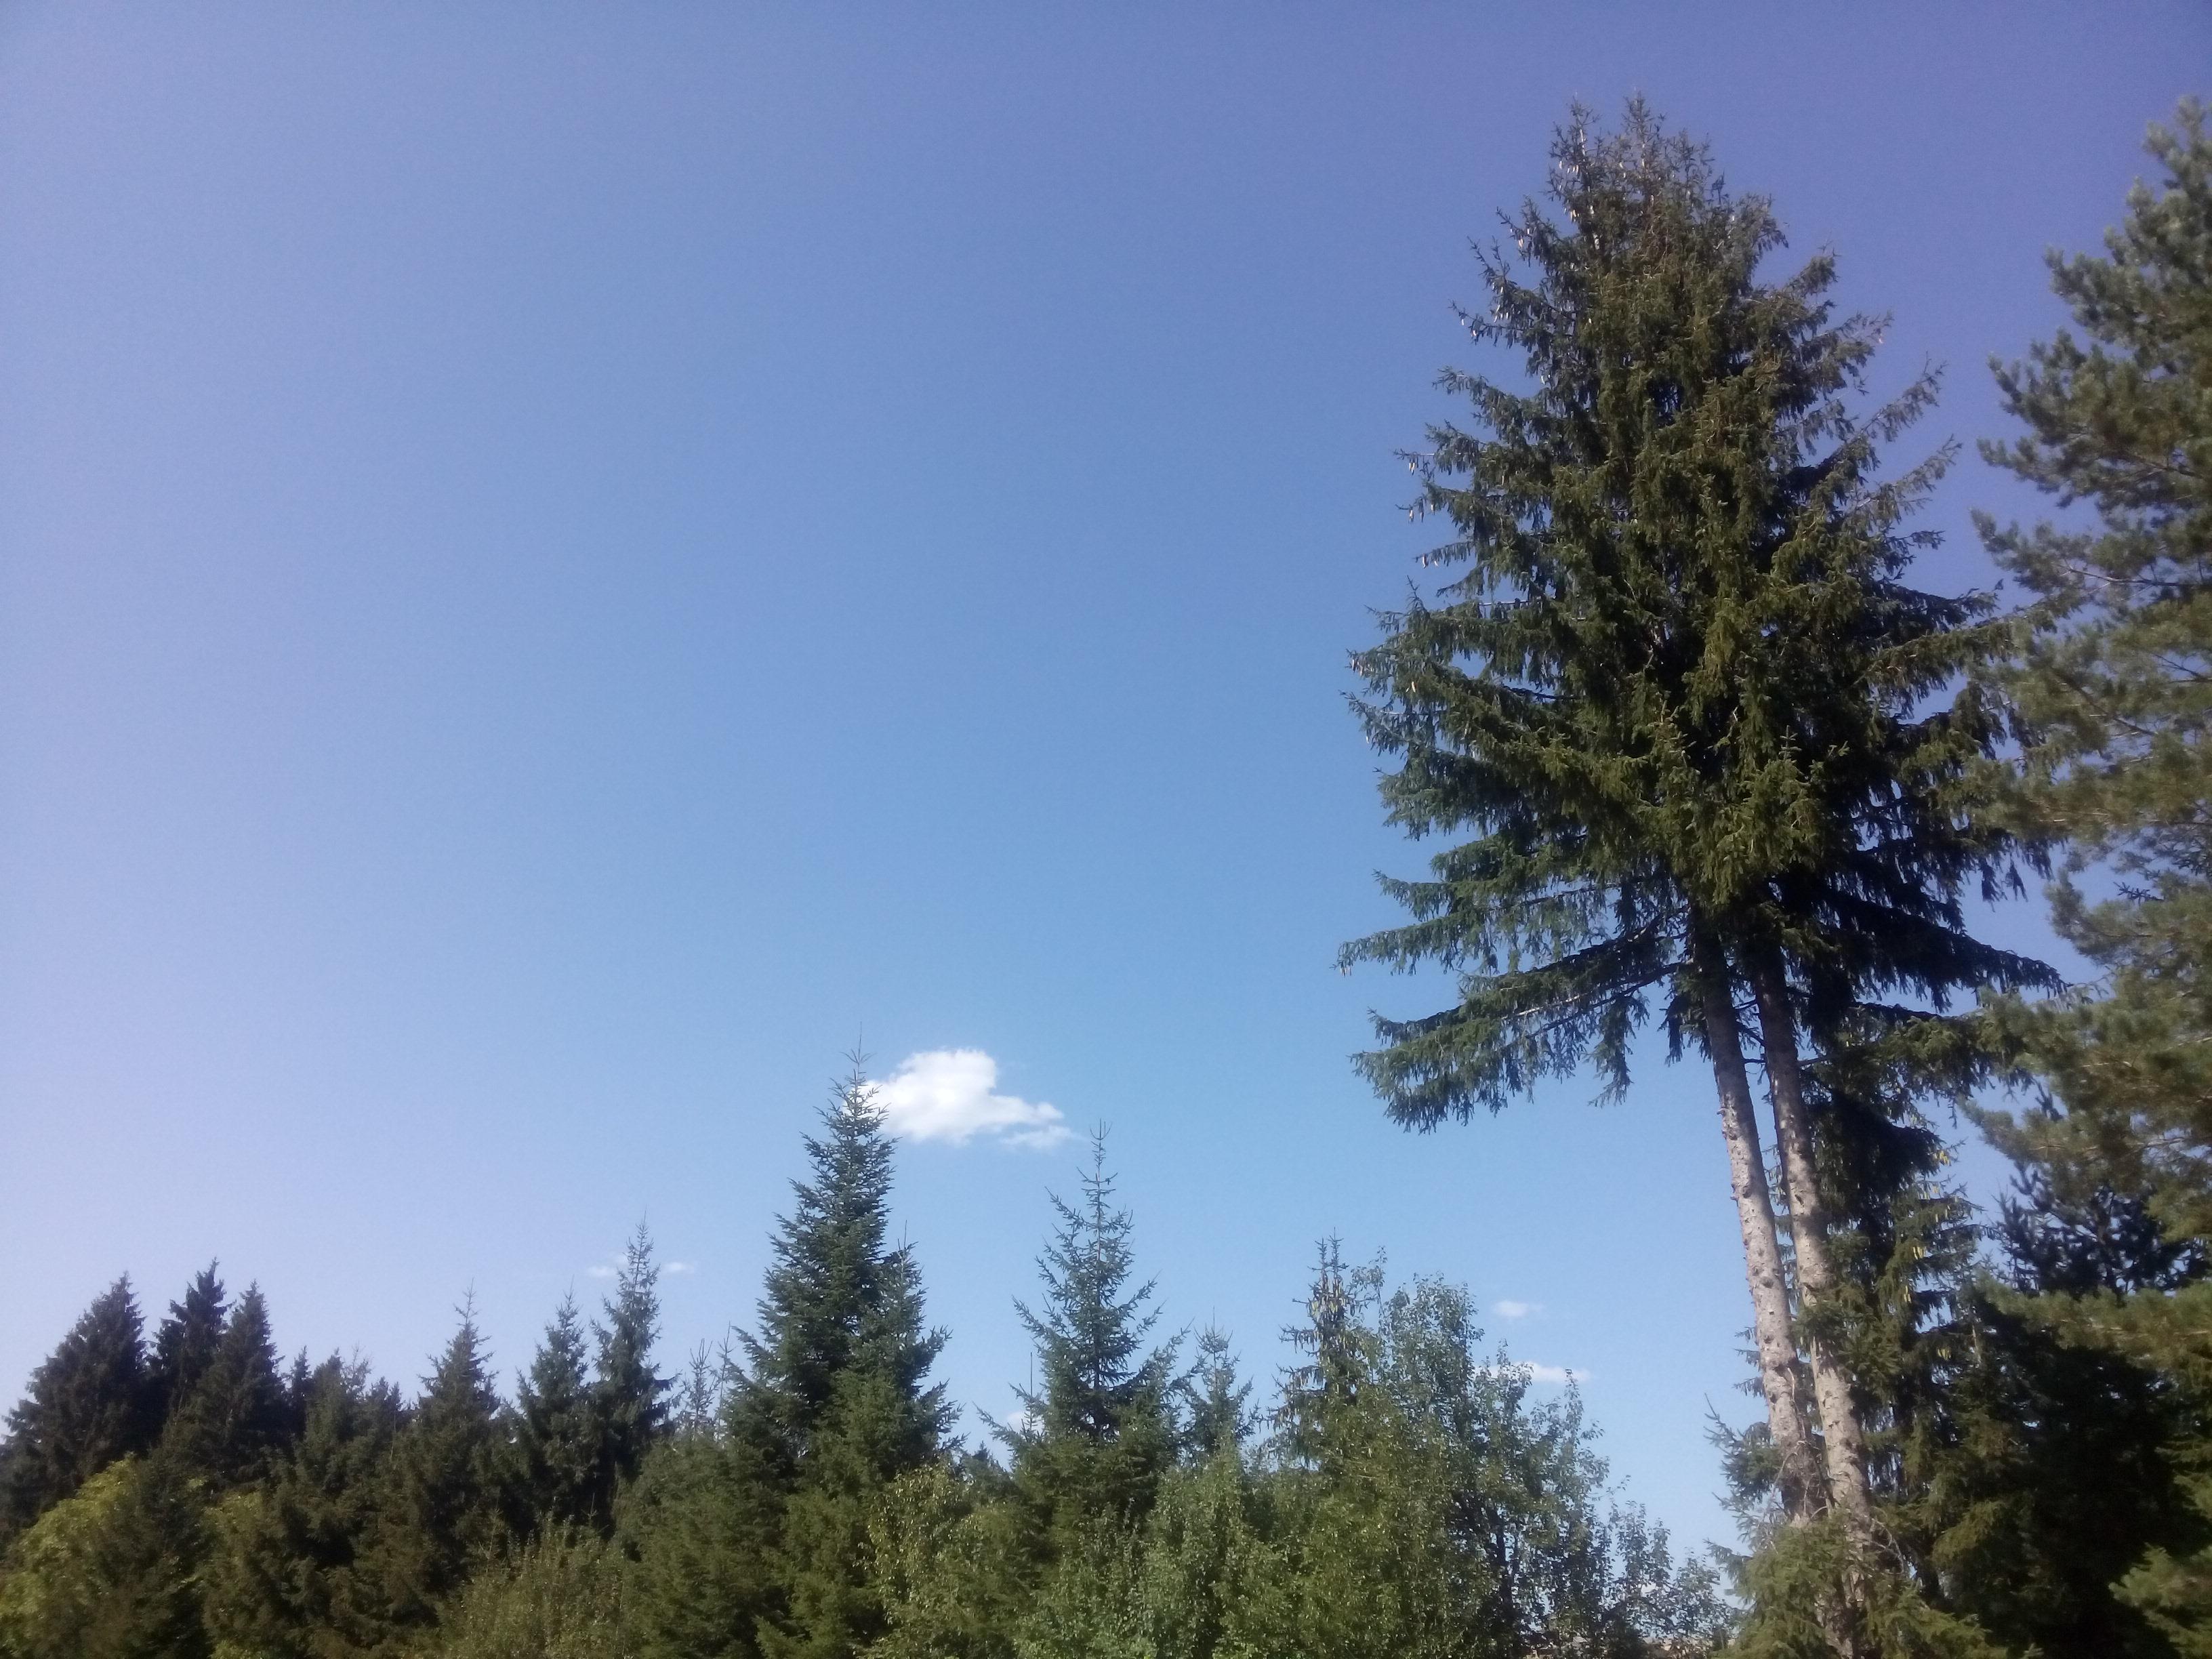 https://i.amy.gy/2017-sarajevo/IMG_20170826_144940.jpg